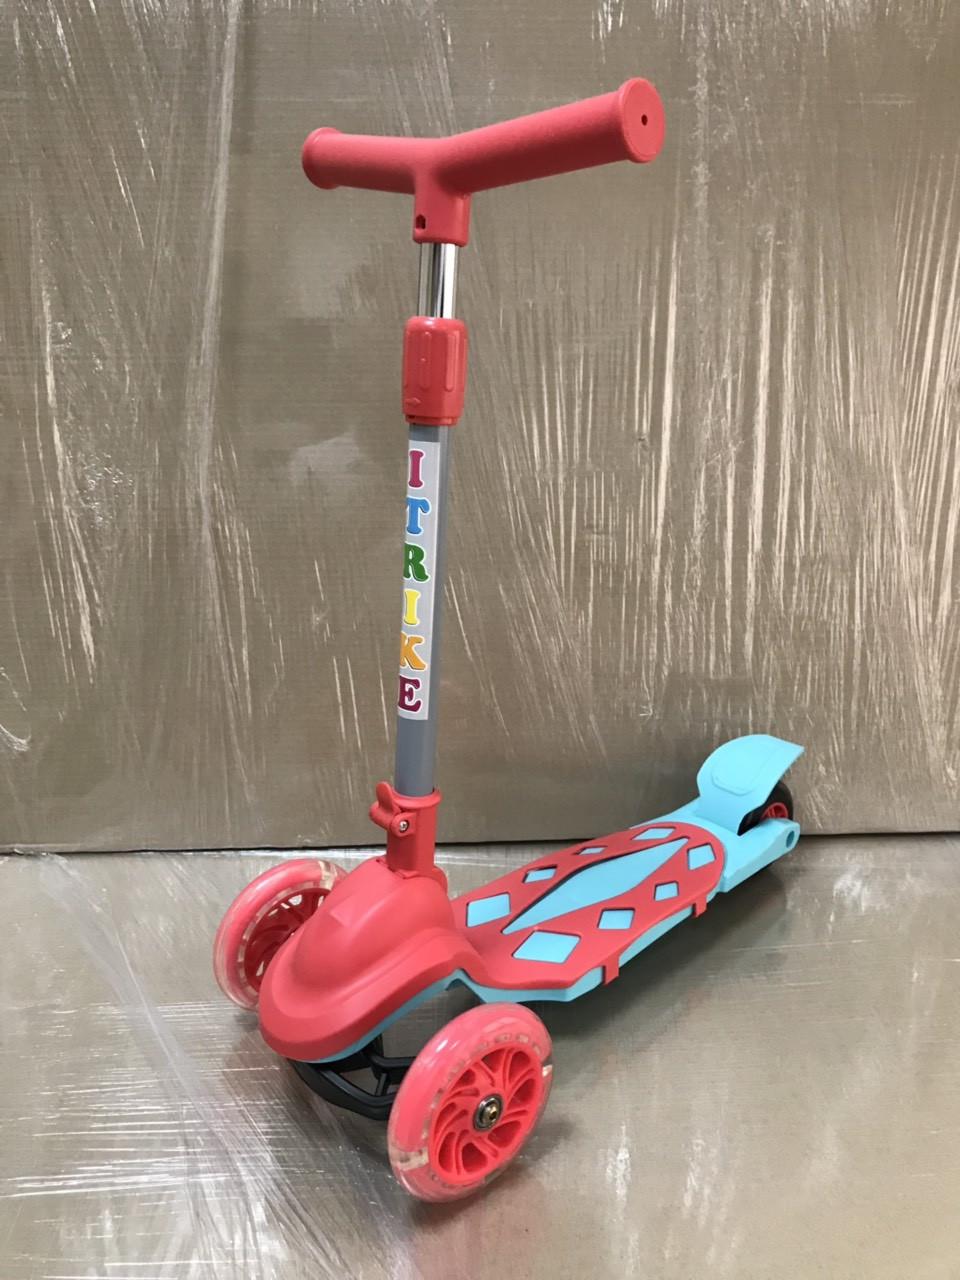 Самокат детский BB 3-030-А  iTrike со складным рулем Гарантия качества Быстрая доставка